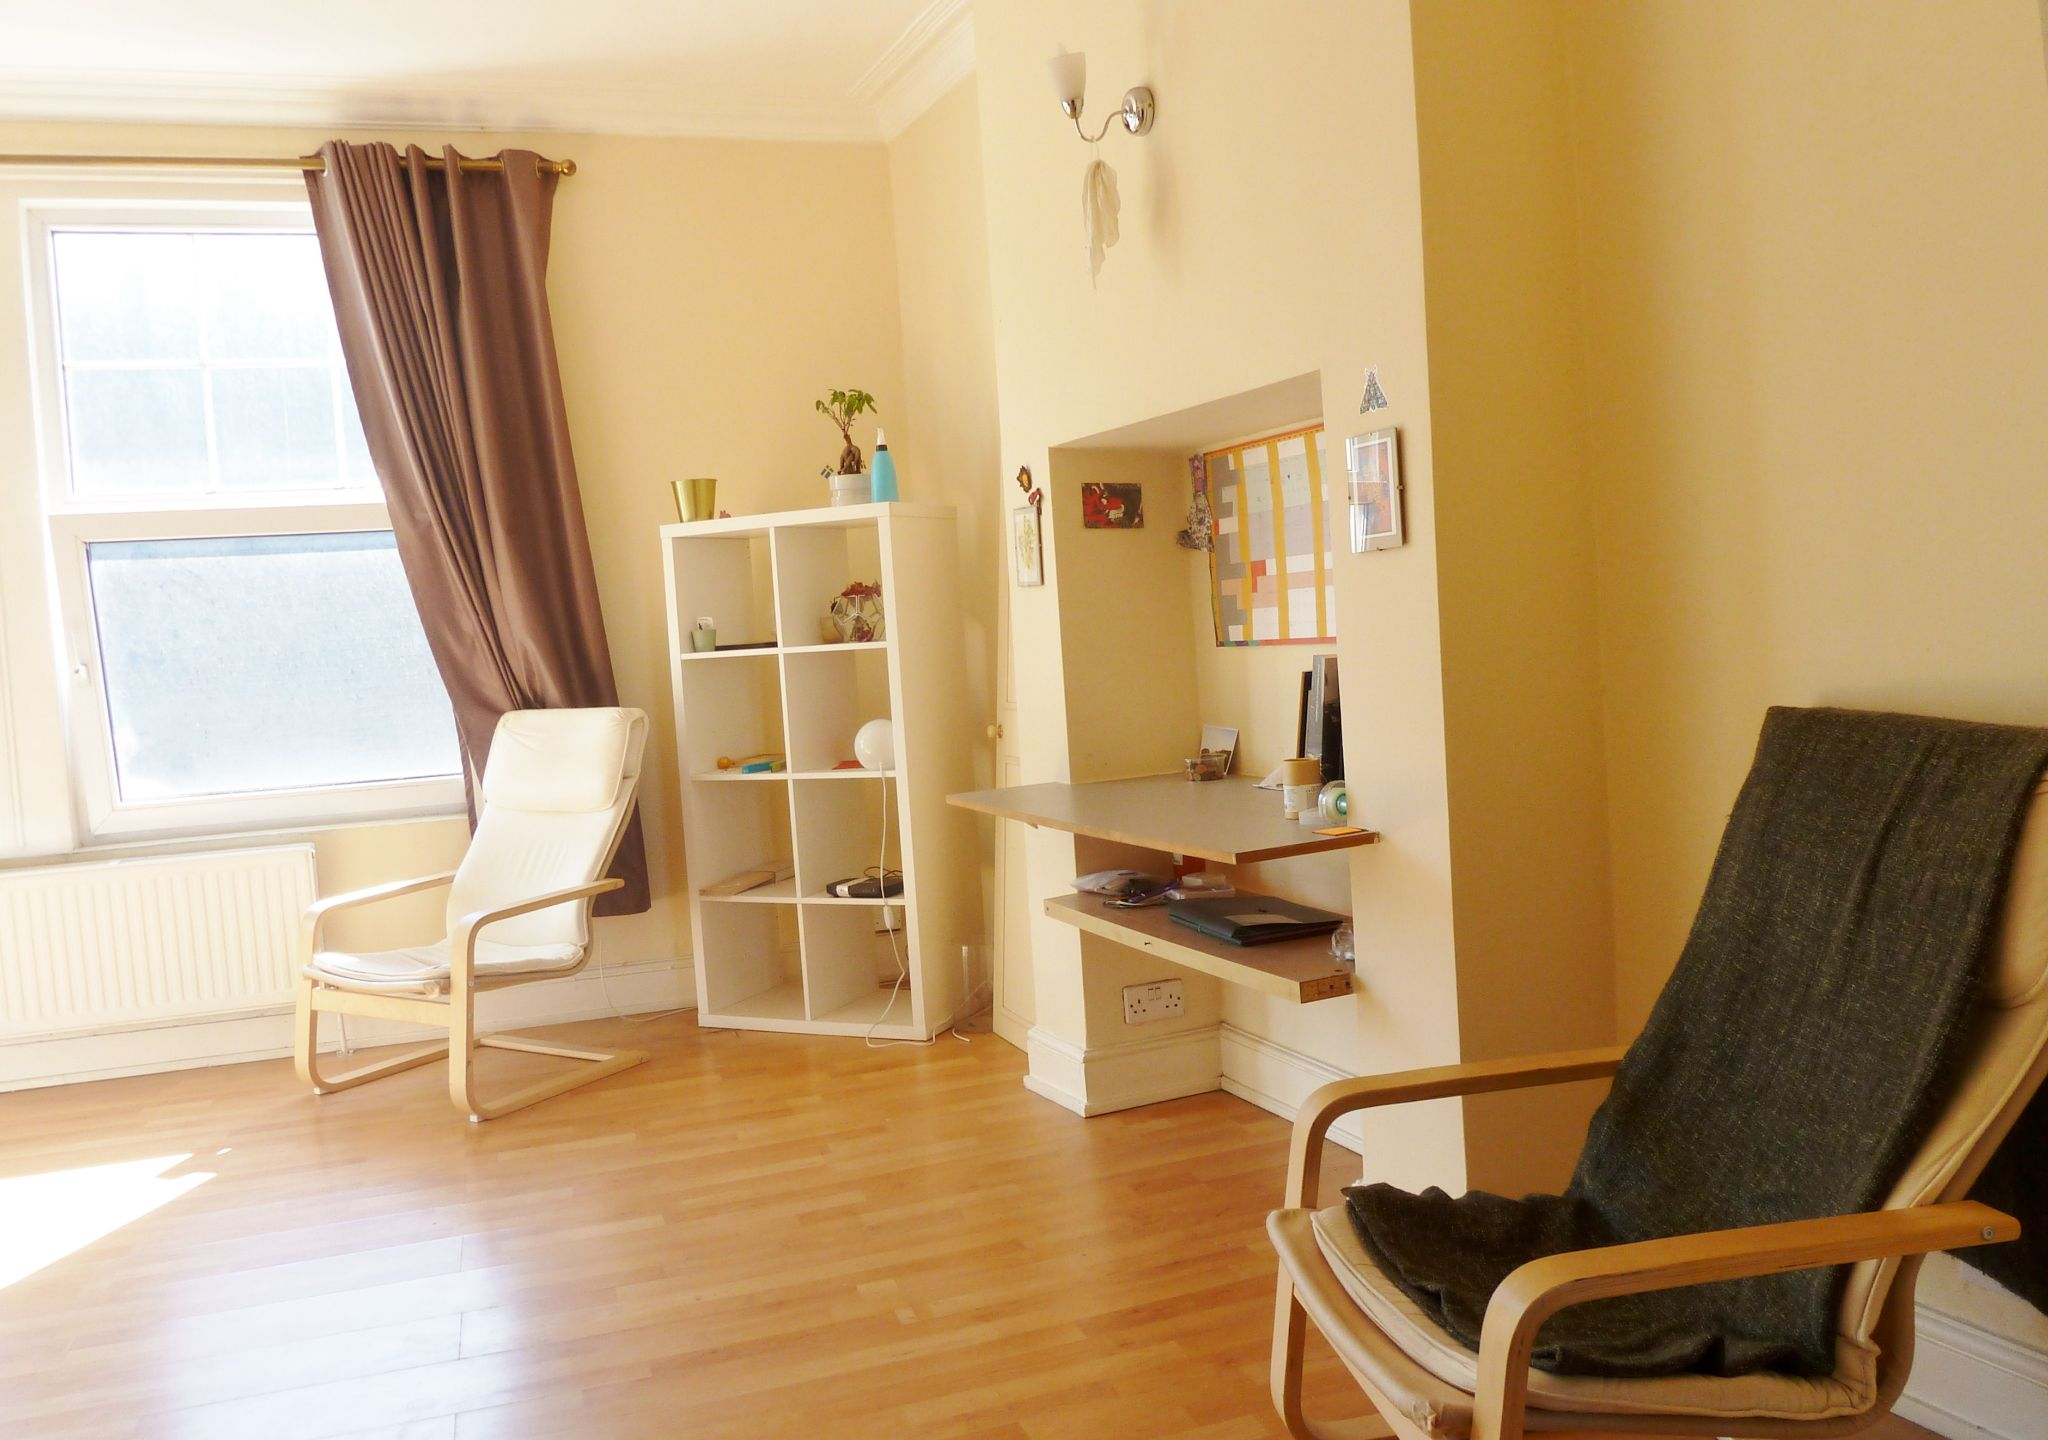 1 bedroom studio flat/apartment To Let in Willesden Green - Laminate flooring throughout